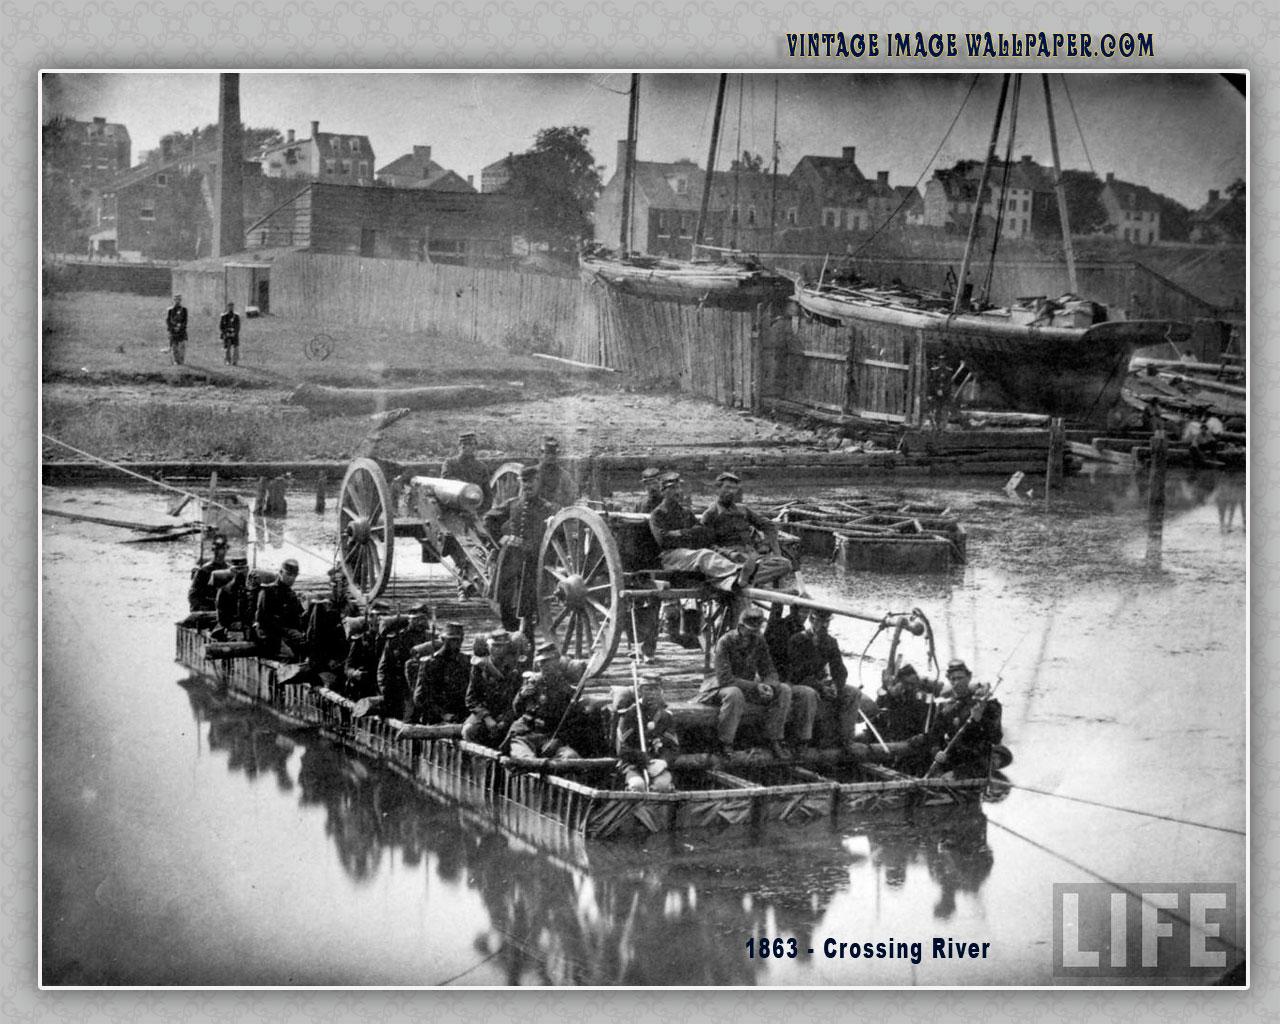 1863 Crossing River Desktop Wallpaper in Vintage 1280x1024